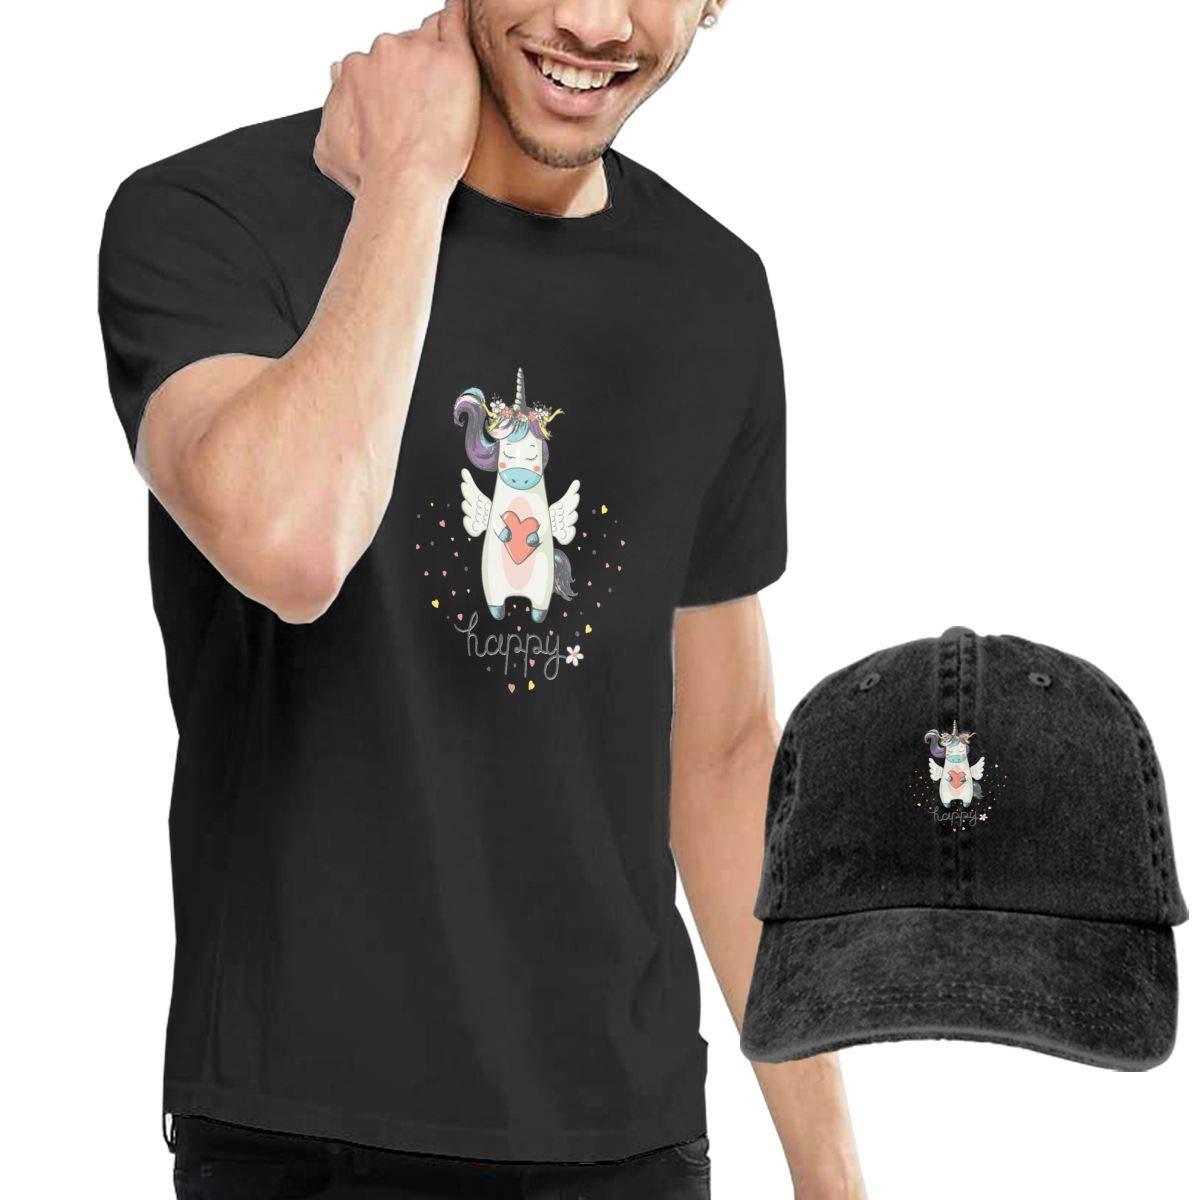 Happy Unicorn Fashion Mens T-Shirt and Hats Youth /& Adult T-Shirts